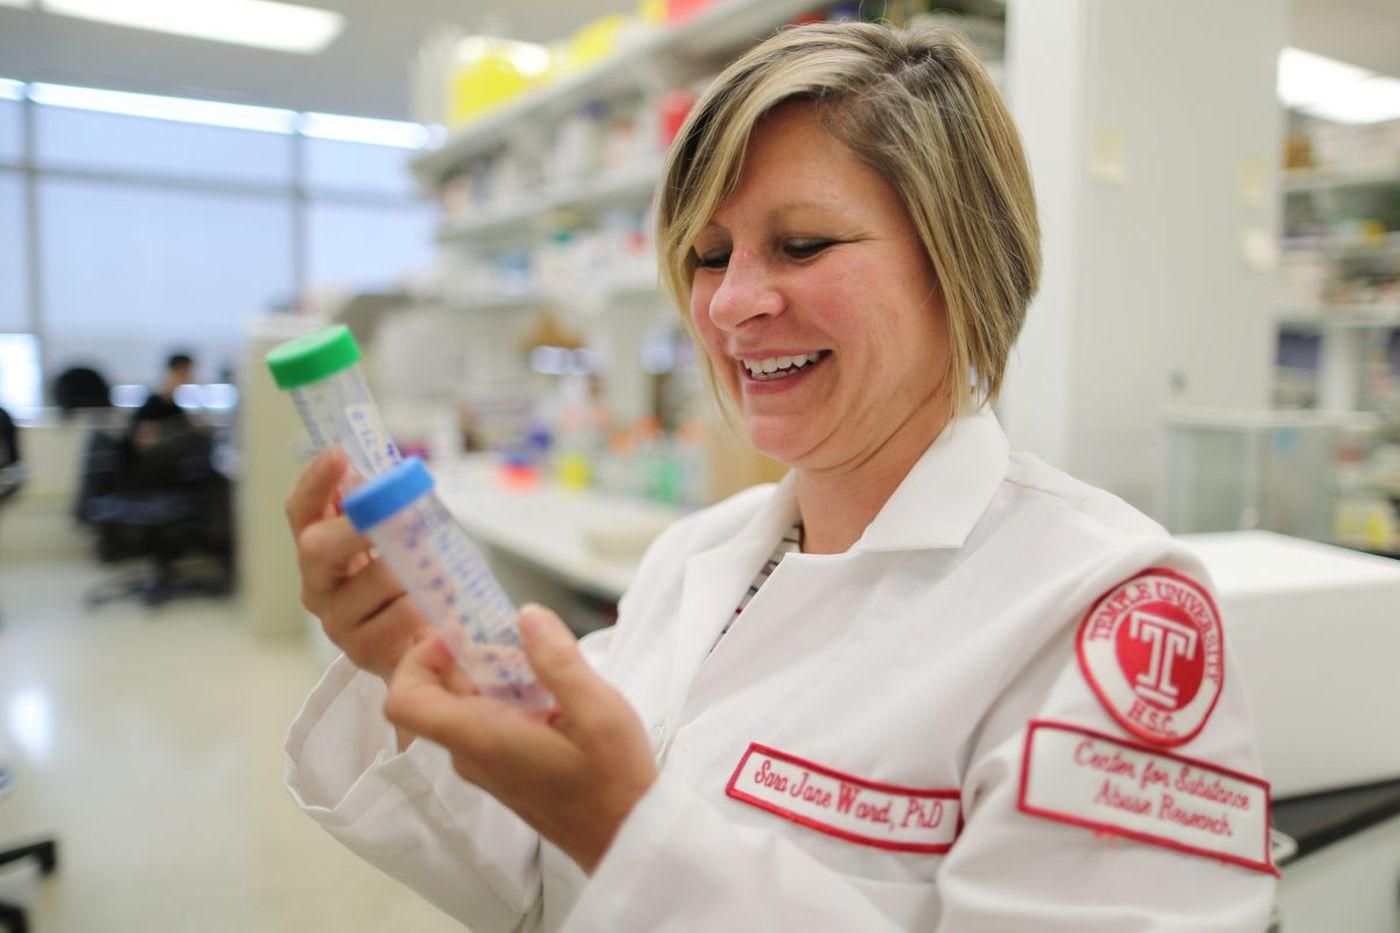 Temple U. researchers take a leading role in medical marijuana studies